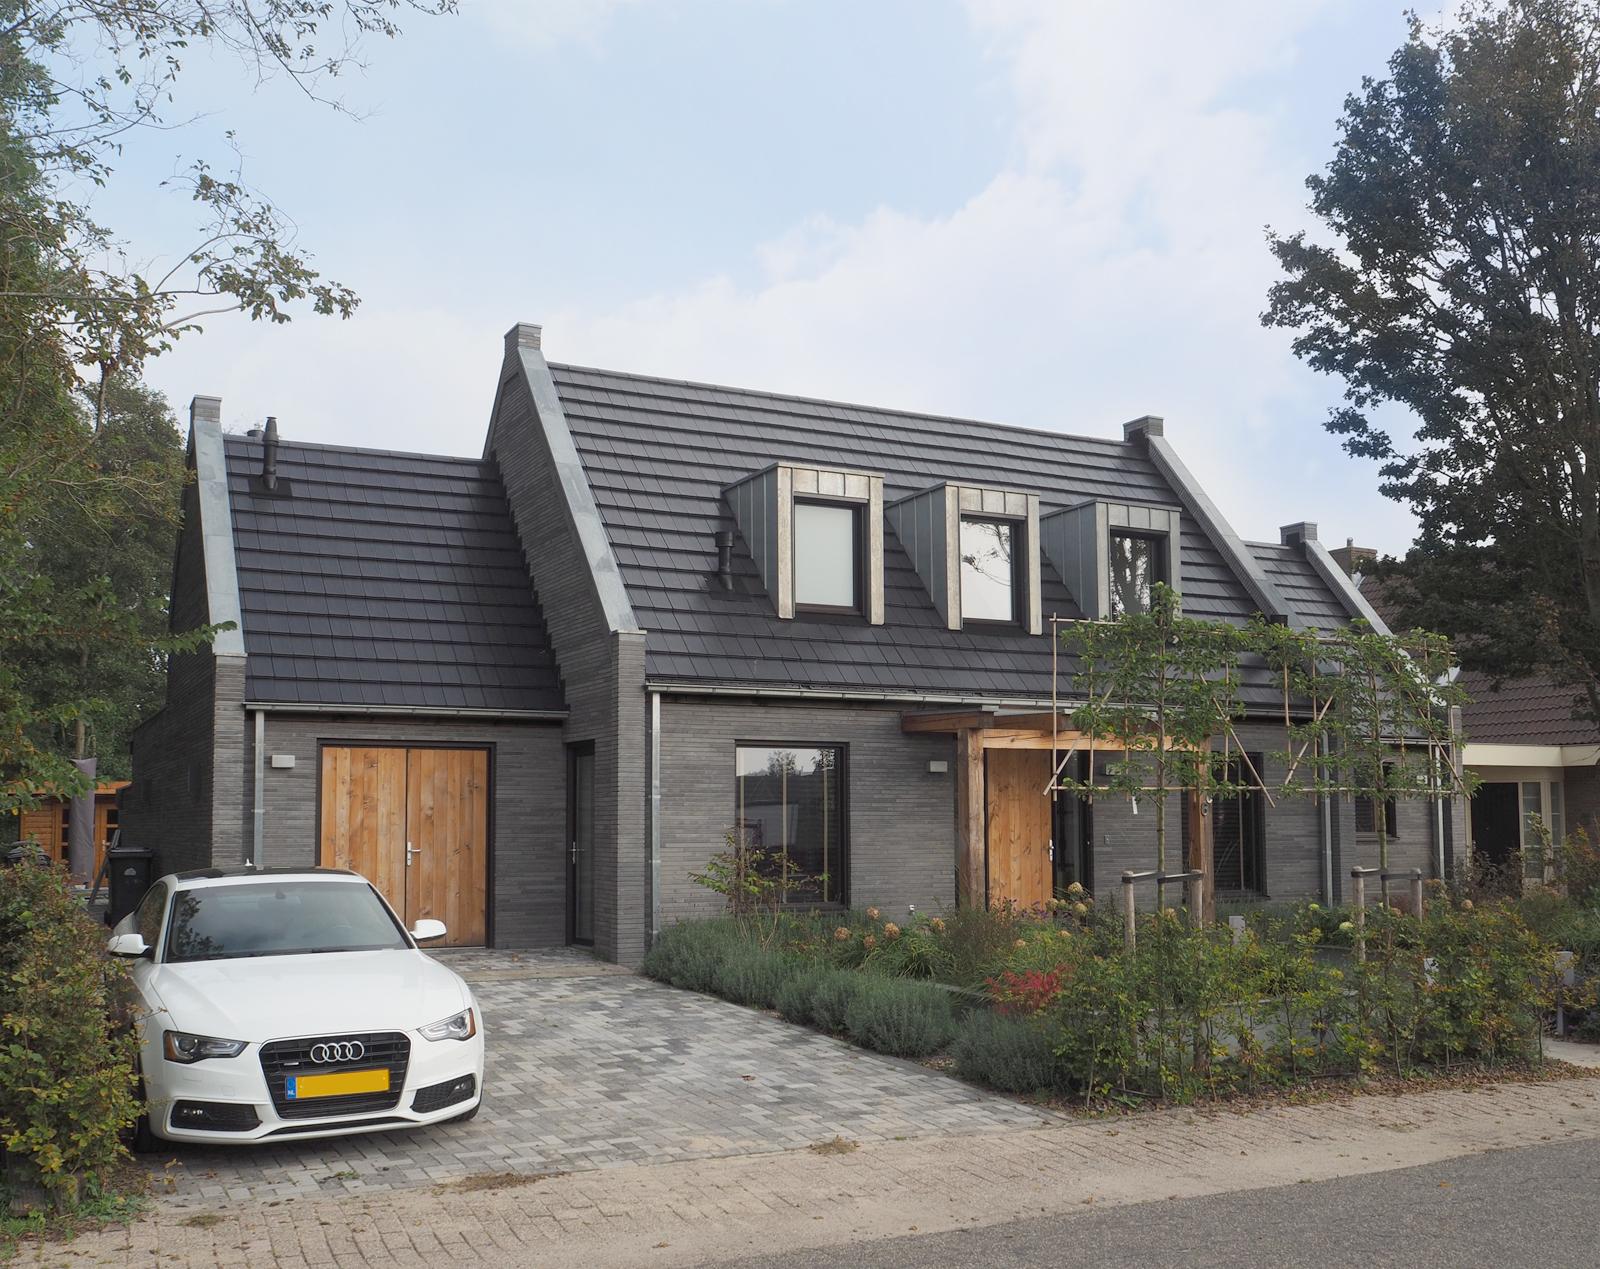 limmen_jeroendenijs_bni_architect_interior_voorschuinaanzicht